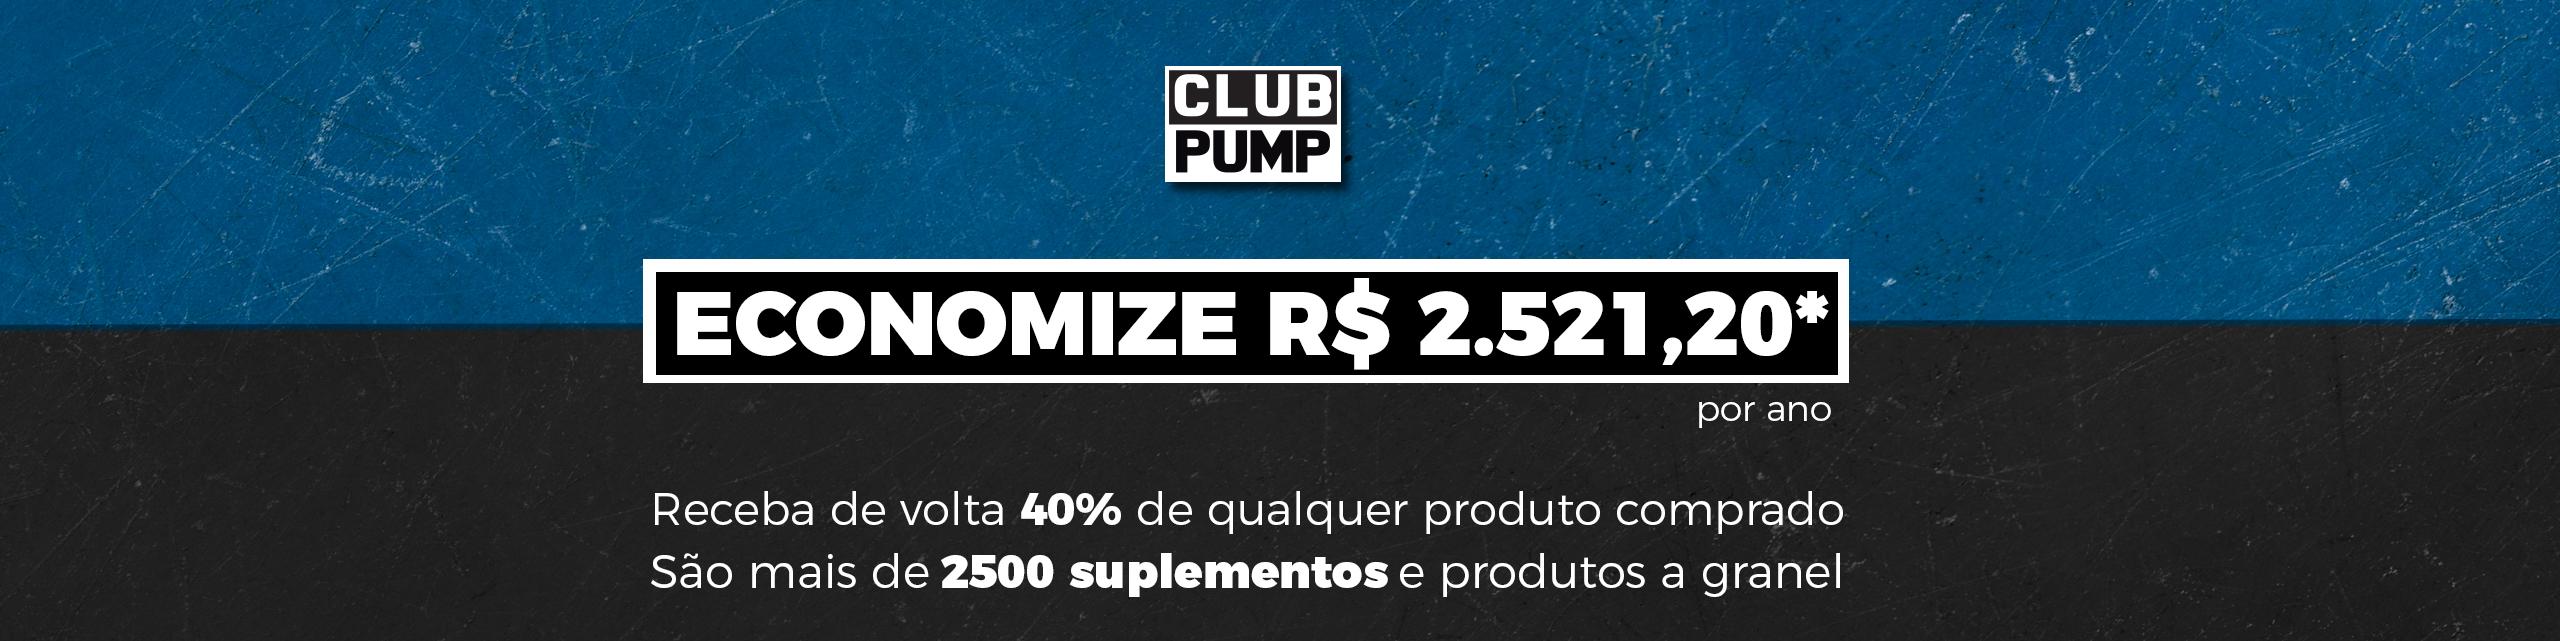 Club Pump - Economize